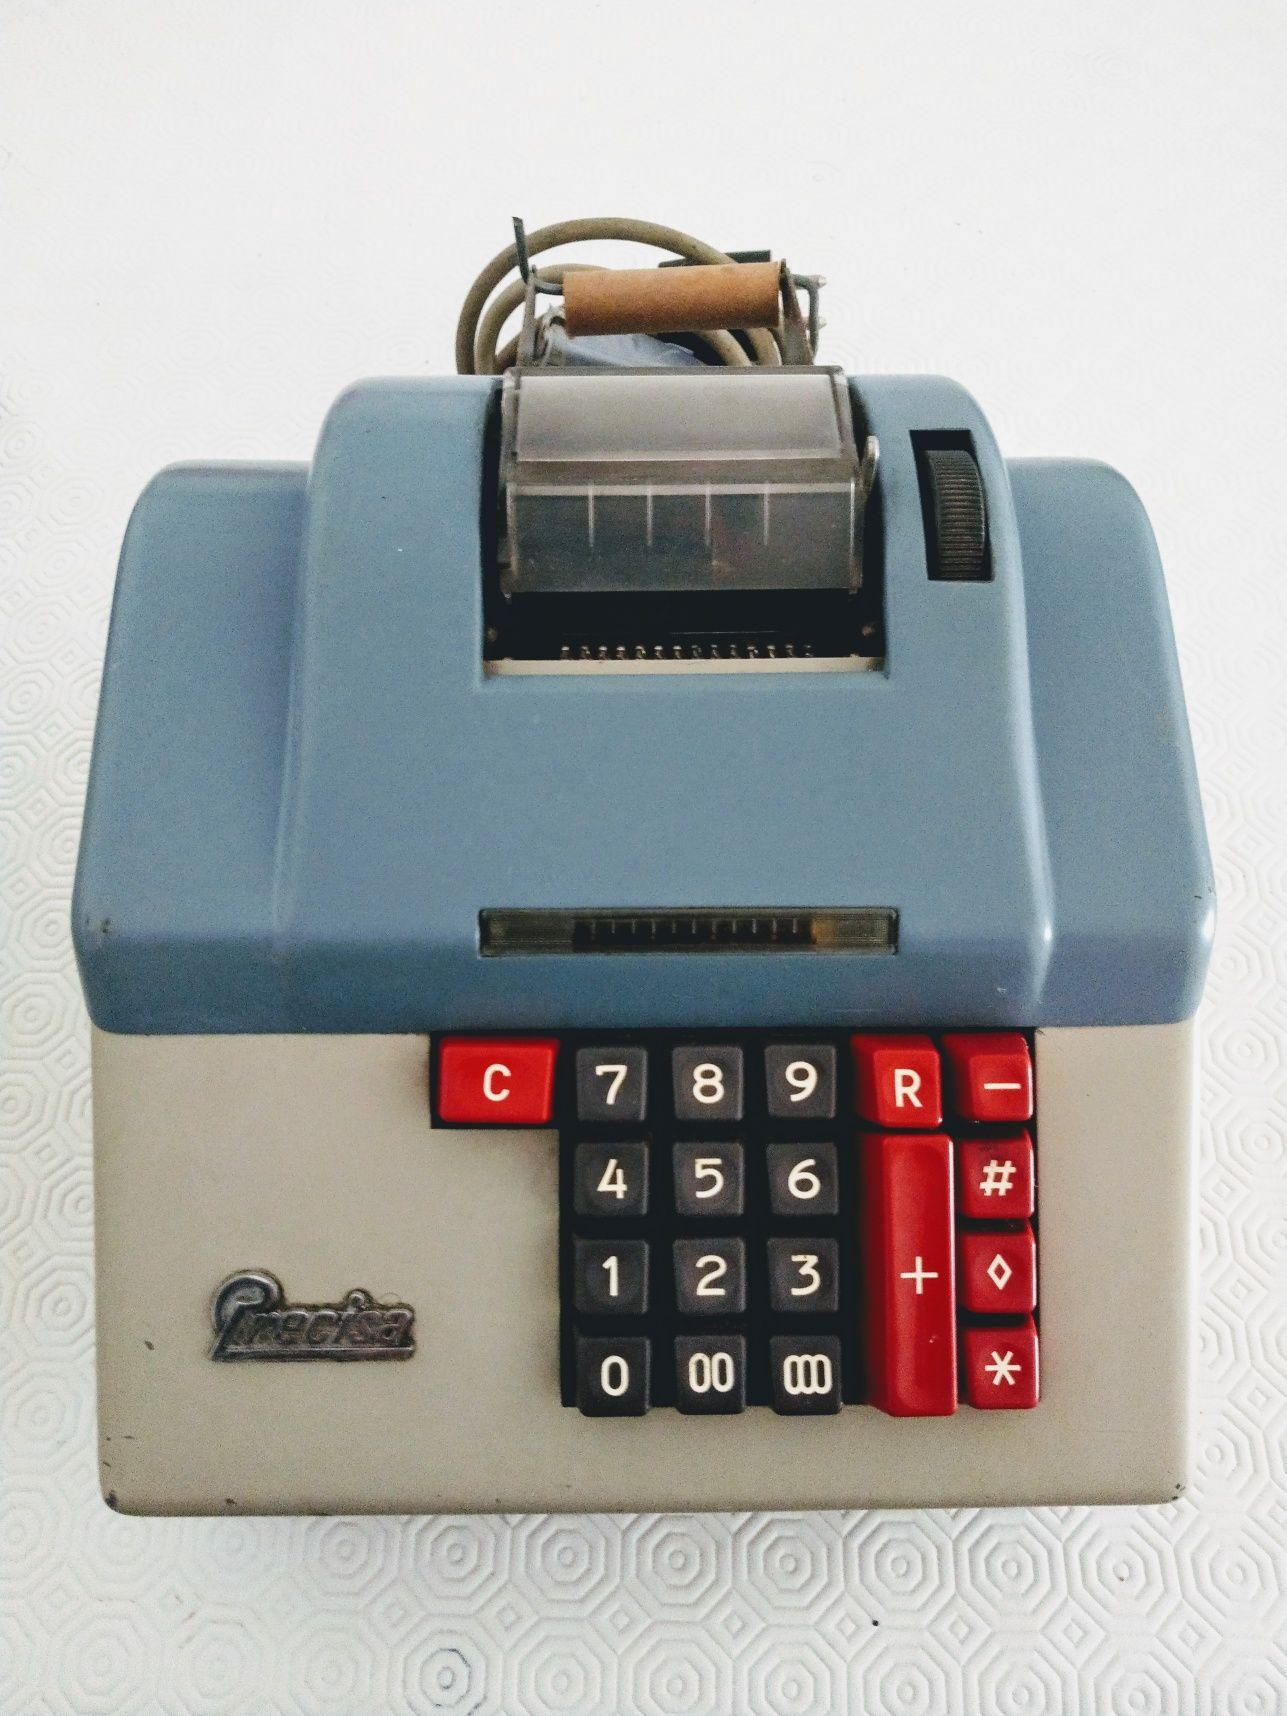 Máquina calculadora antiga Precisa a funcionar